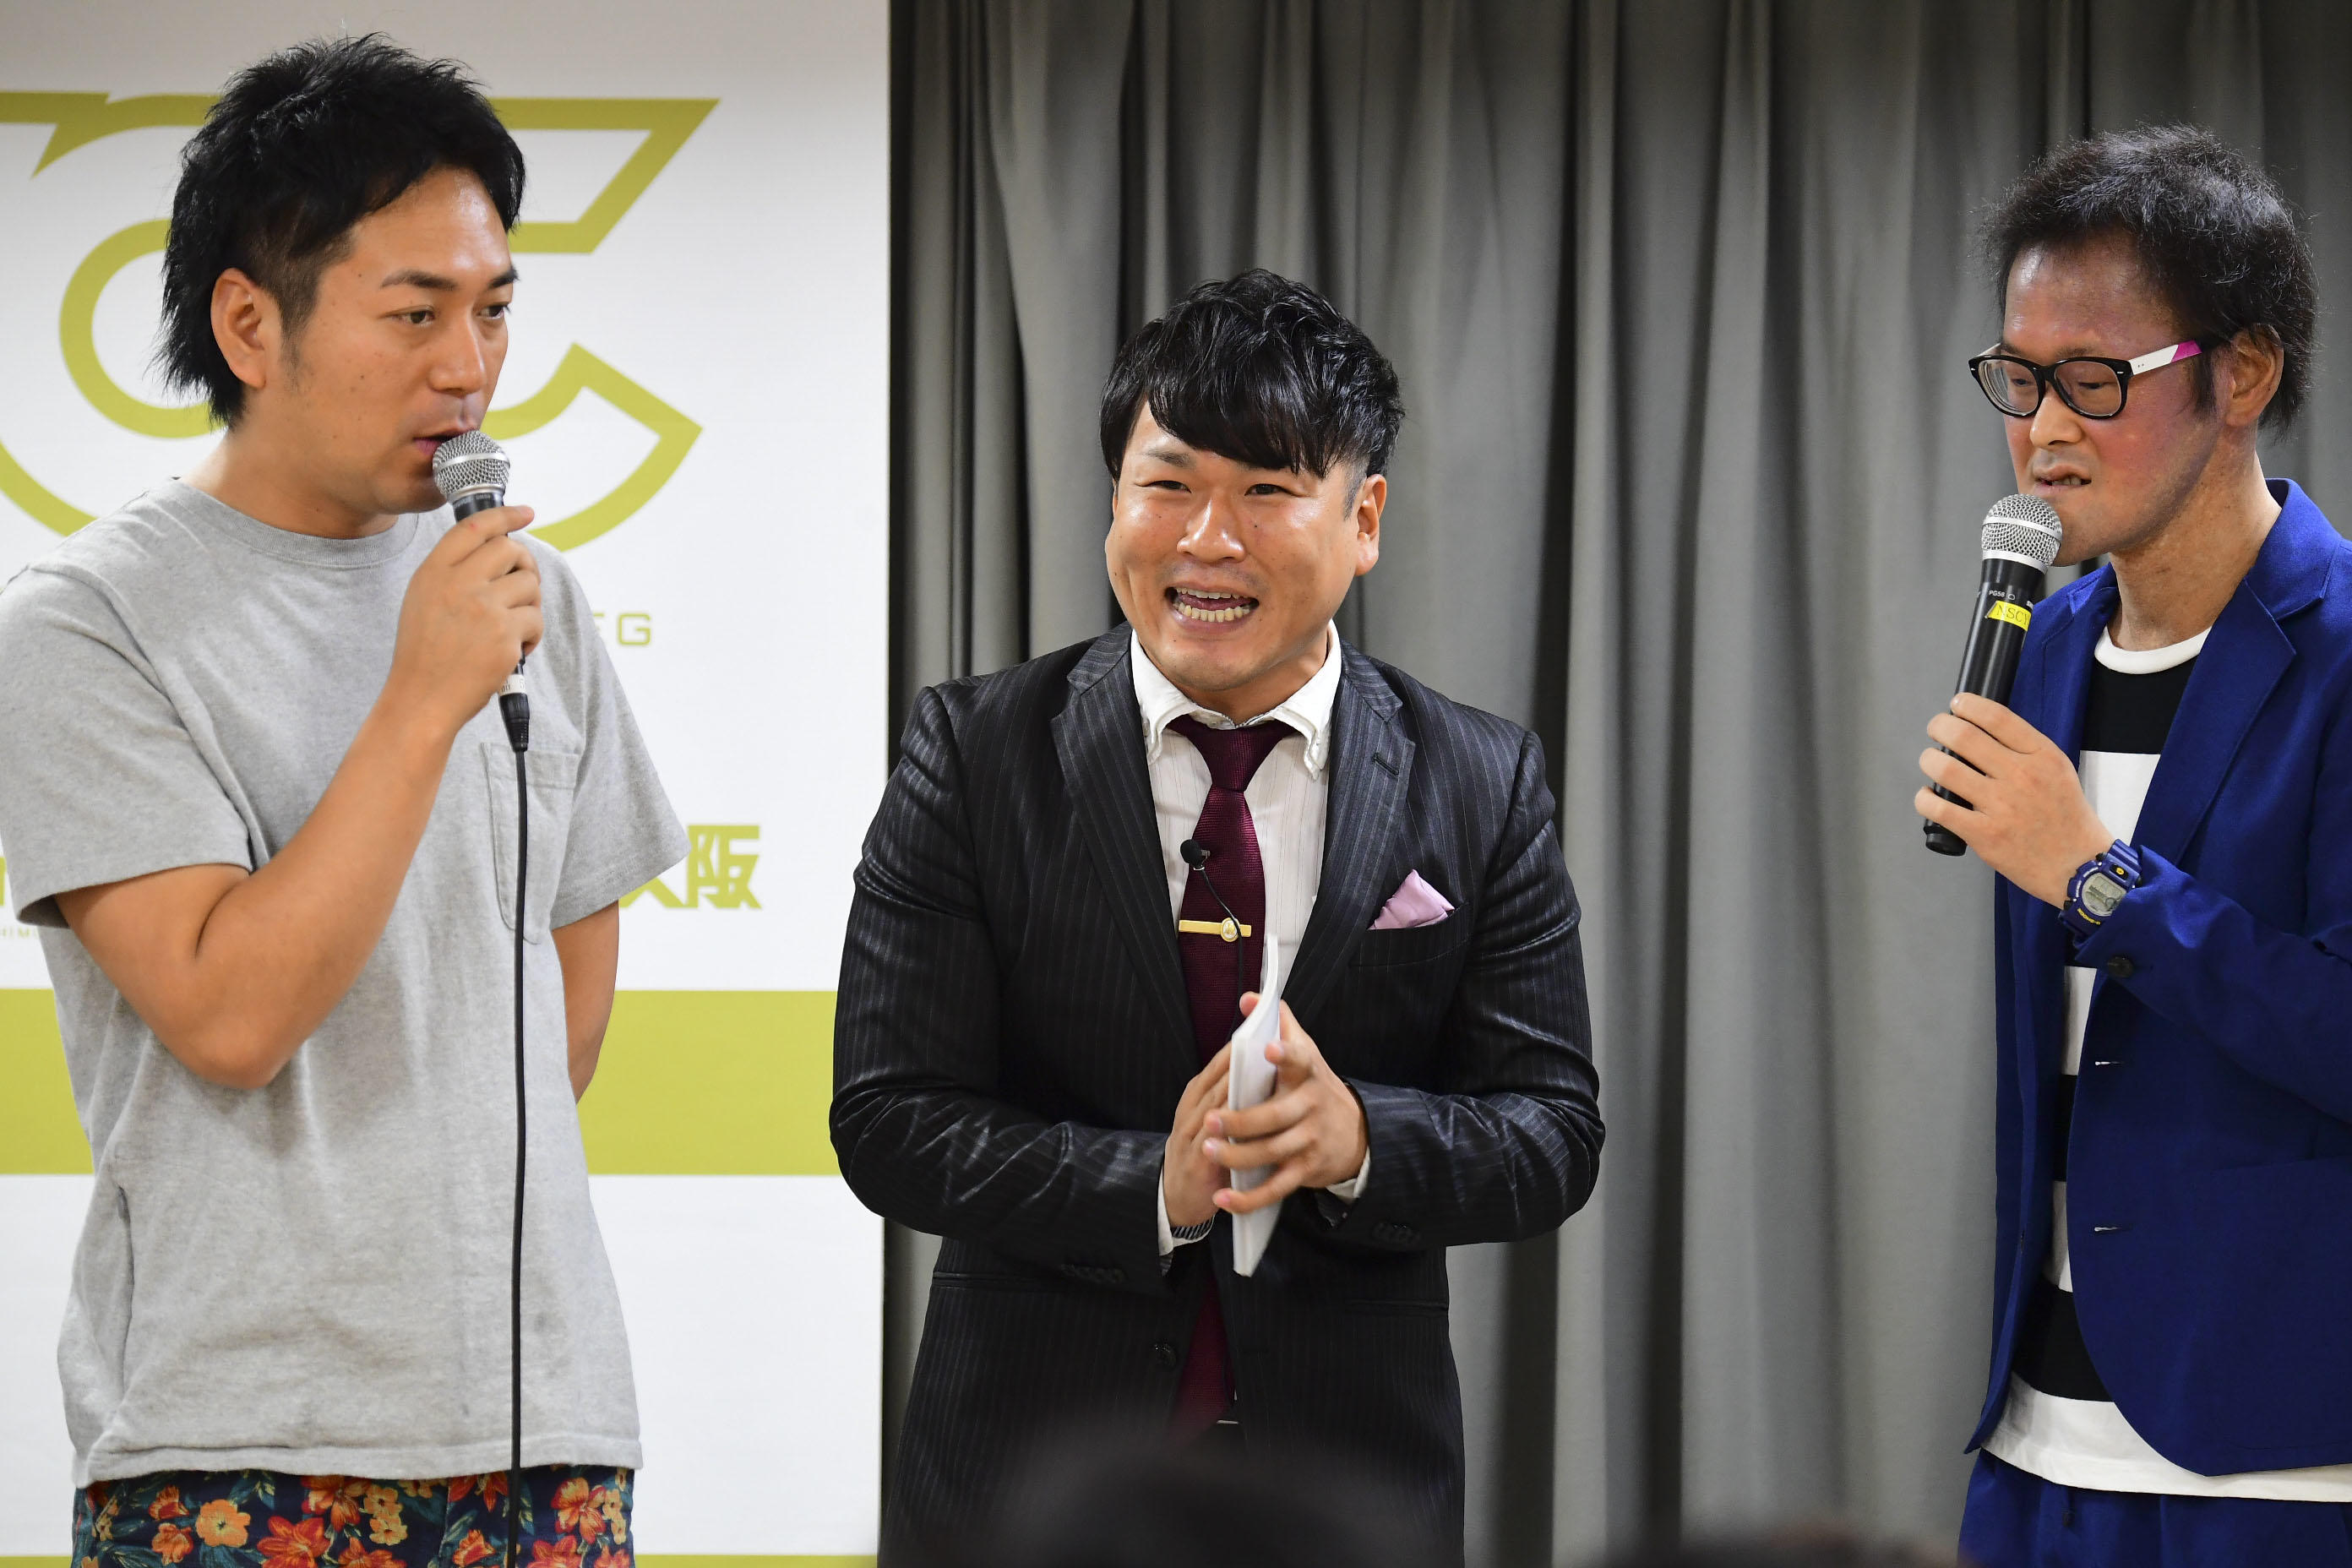 http://news.yoshimoto.co.jp/20170830144807-72a153e78687c18e89cc3dfbd43b5368f12e8a27.jpg